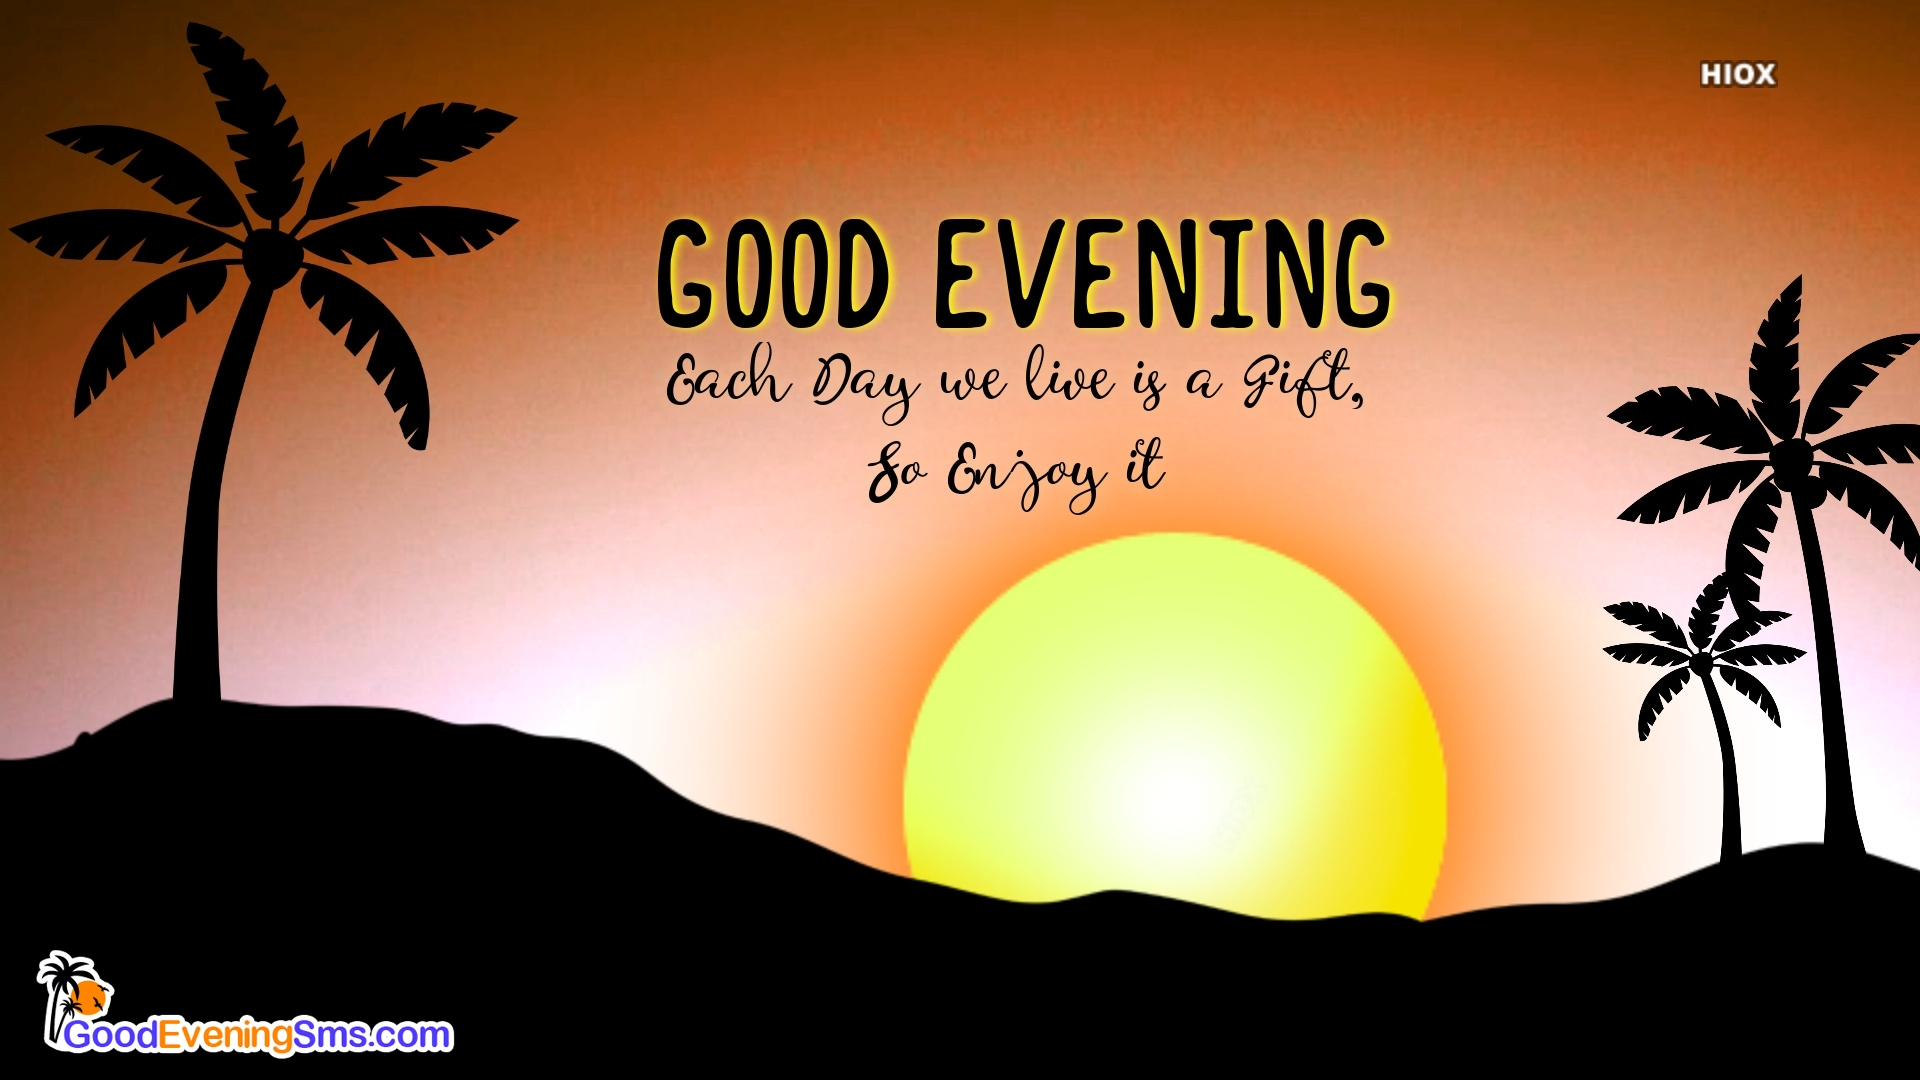 Good Evening Sms Image